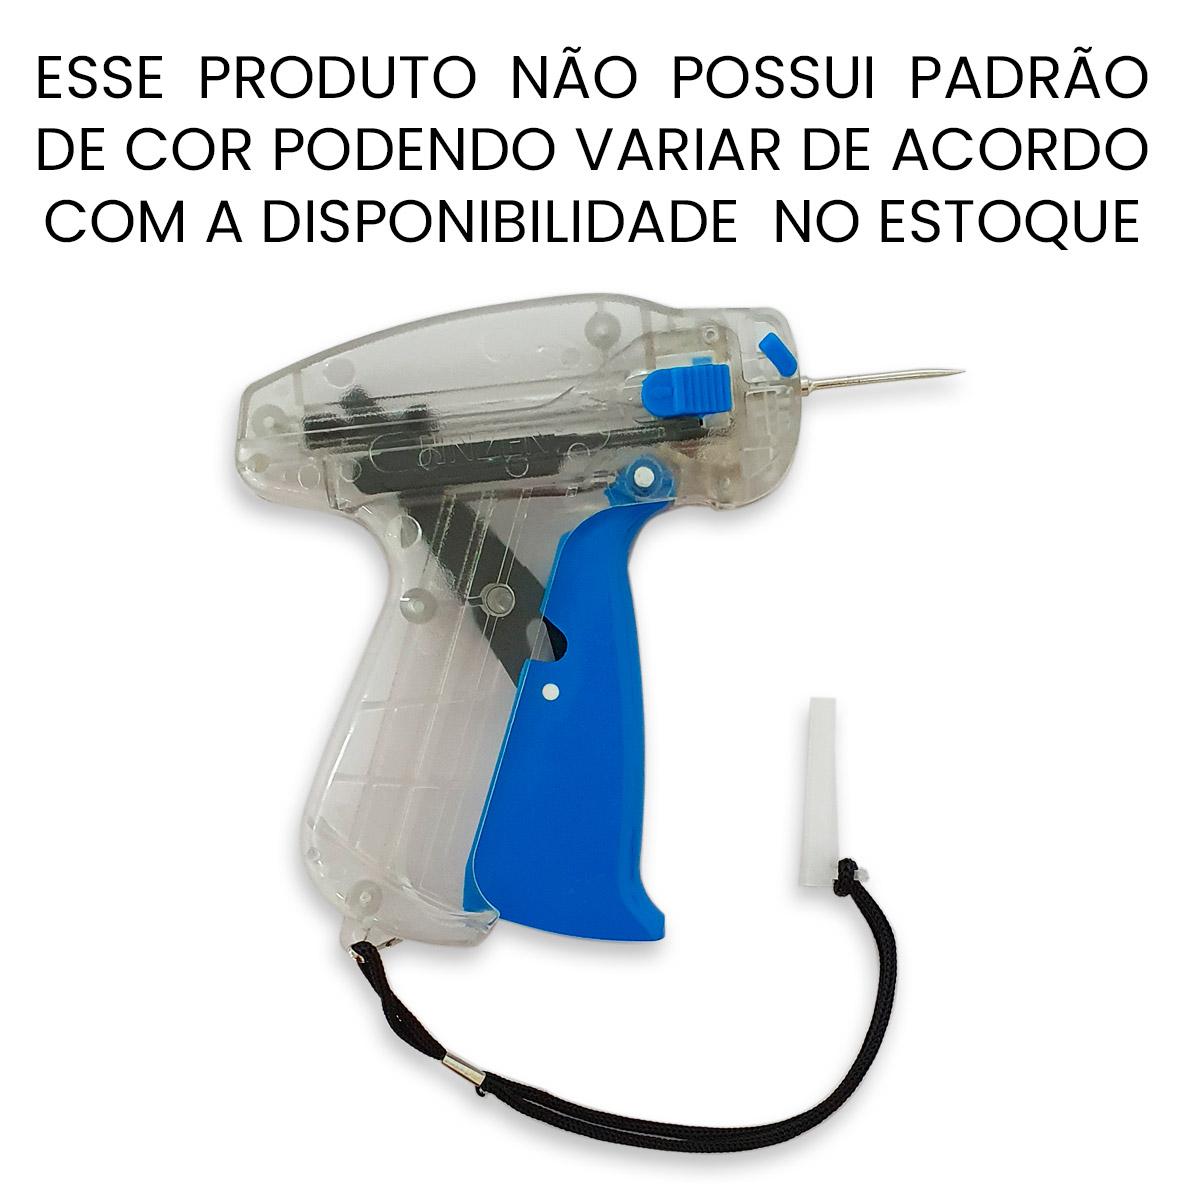 Etiquetadora Manual Rotuladora MX 5500 + Pistola Tag Pin  - Pavvia Agulhas e Peças